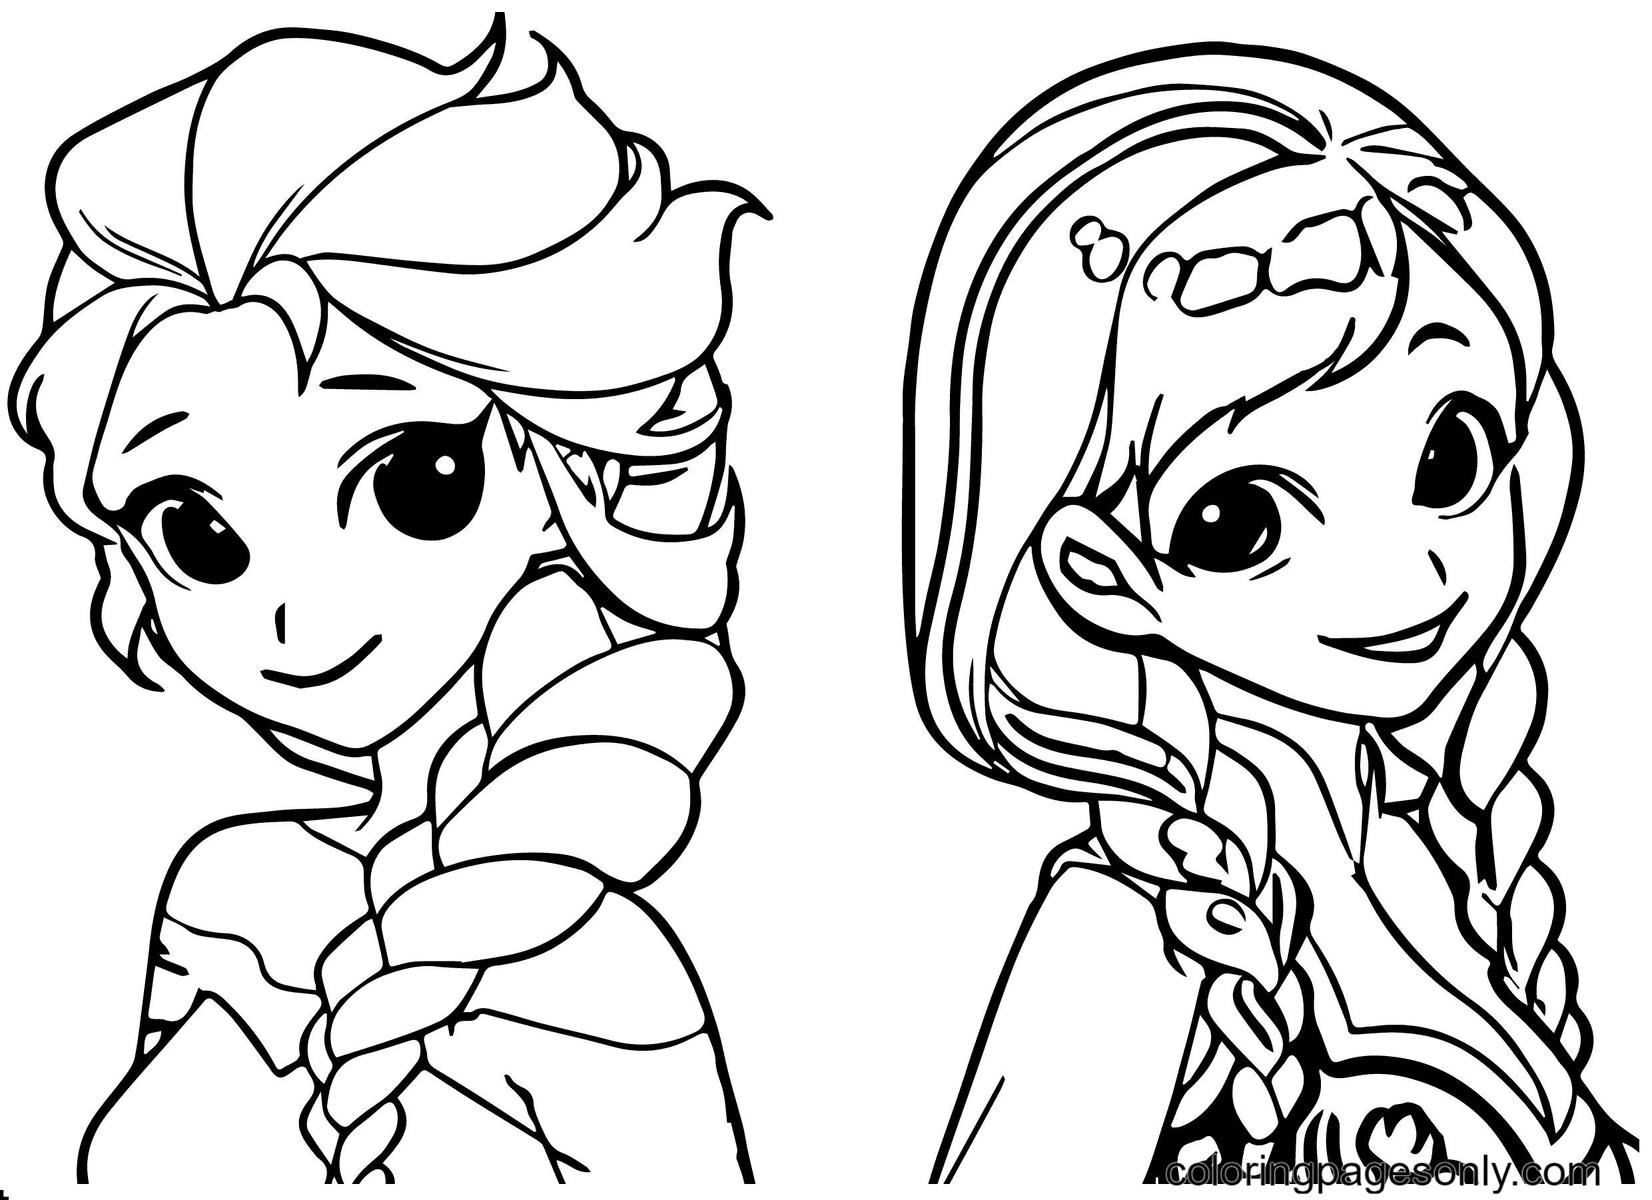 Anna & Elsa Coloring Page